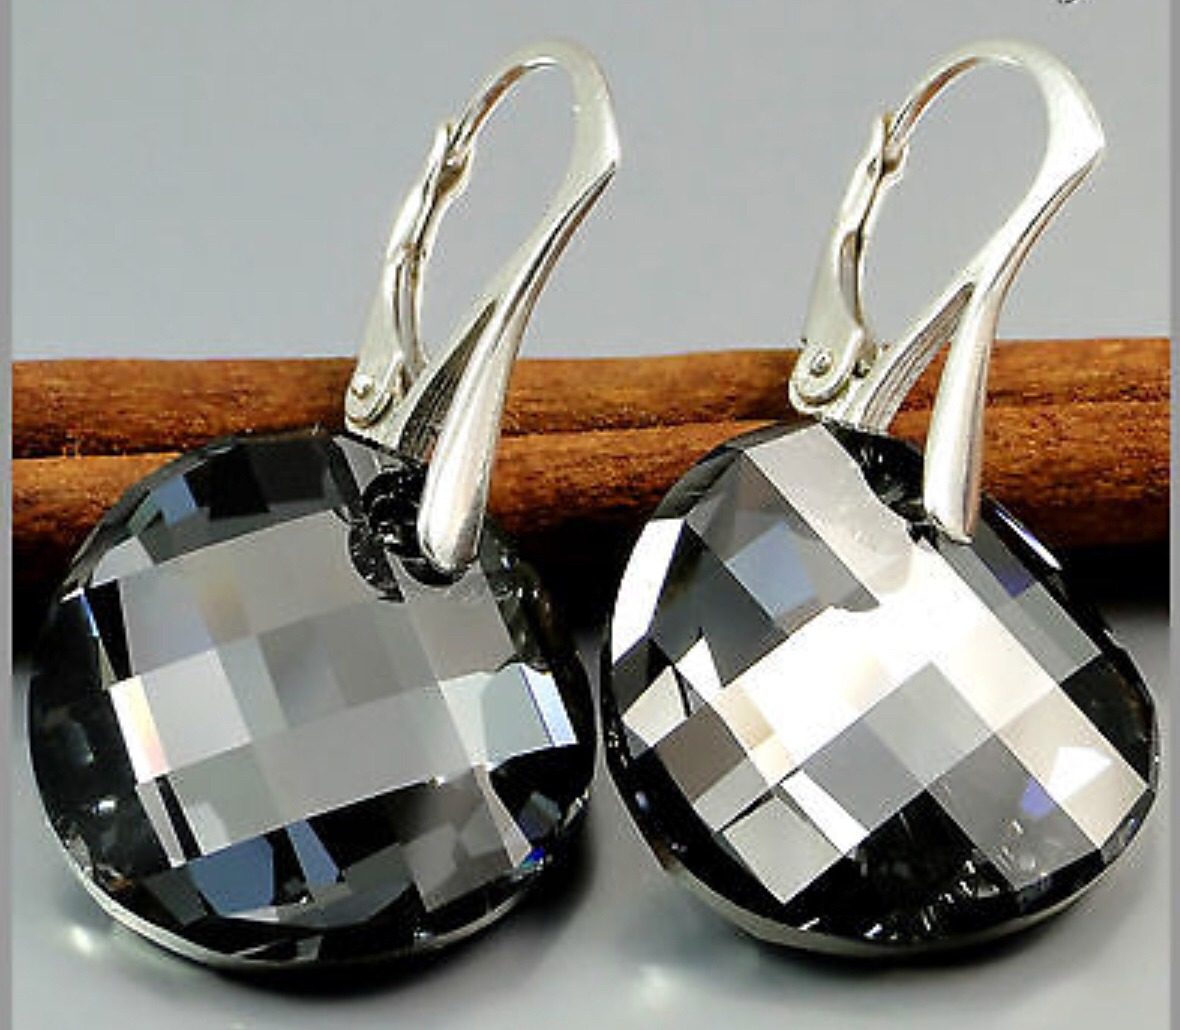 f744878627f5 aros cristal swarovski plata 925 italia garantia certificado. Cargando zoom.